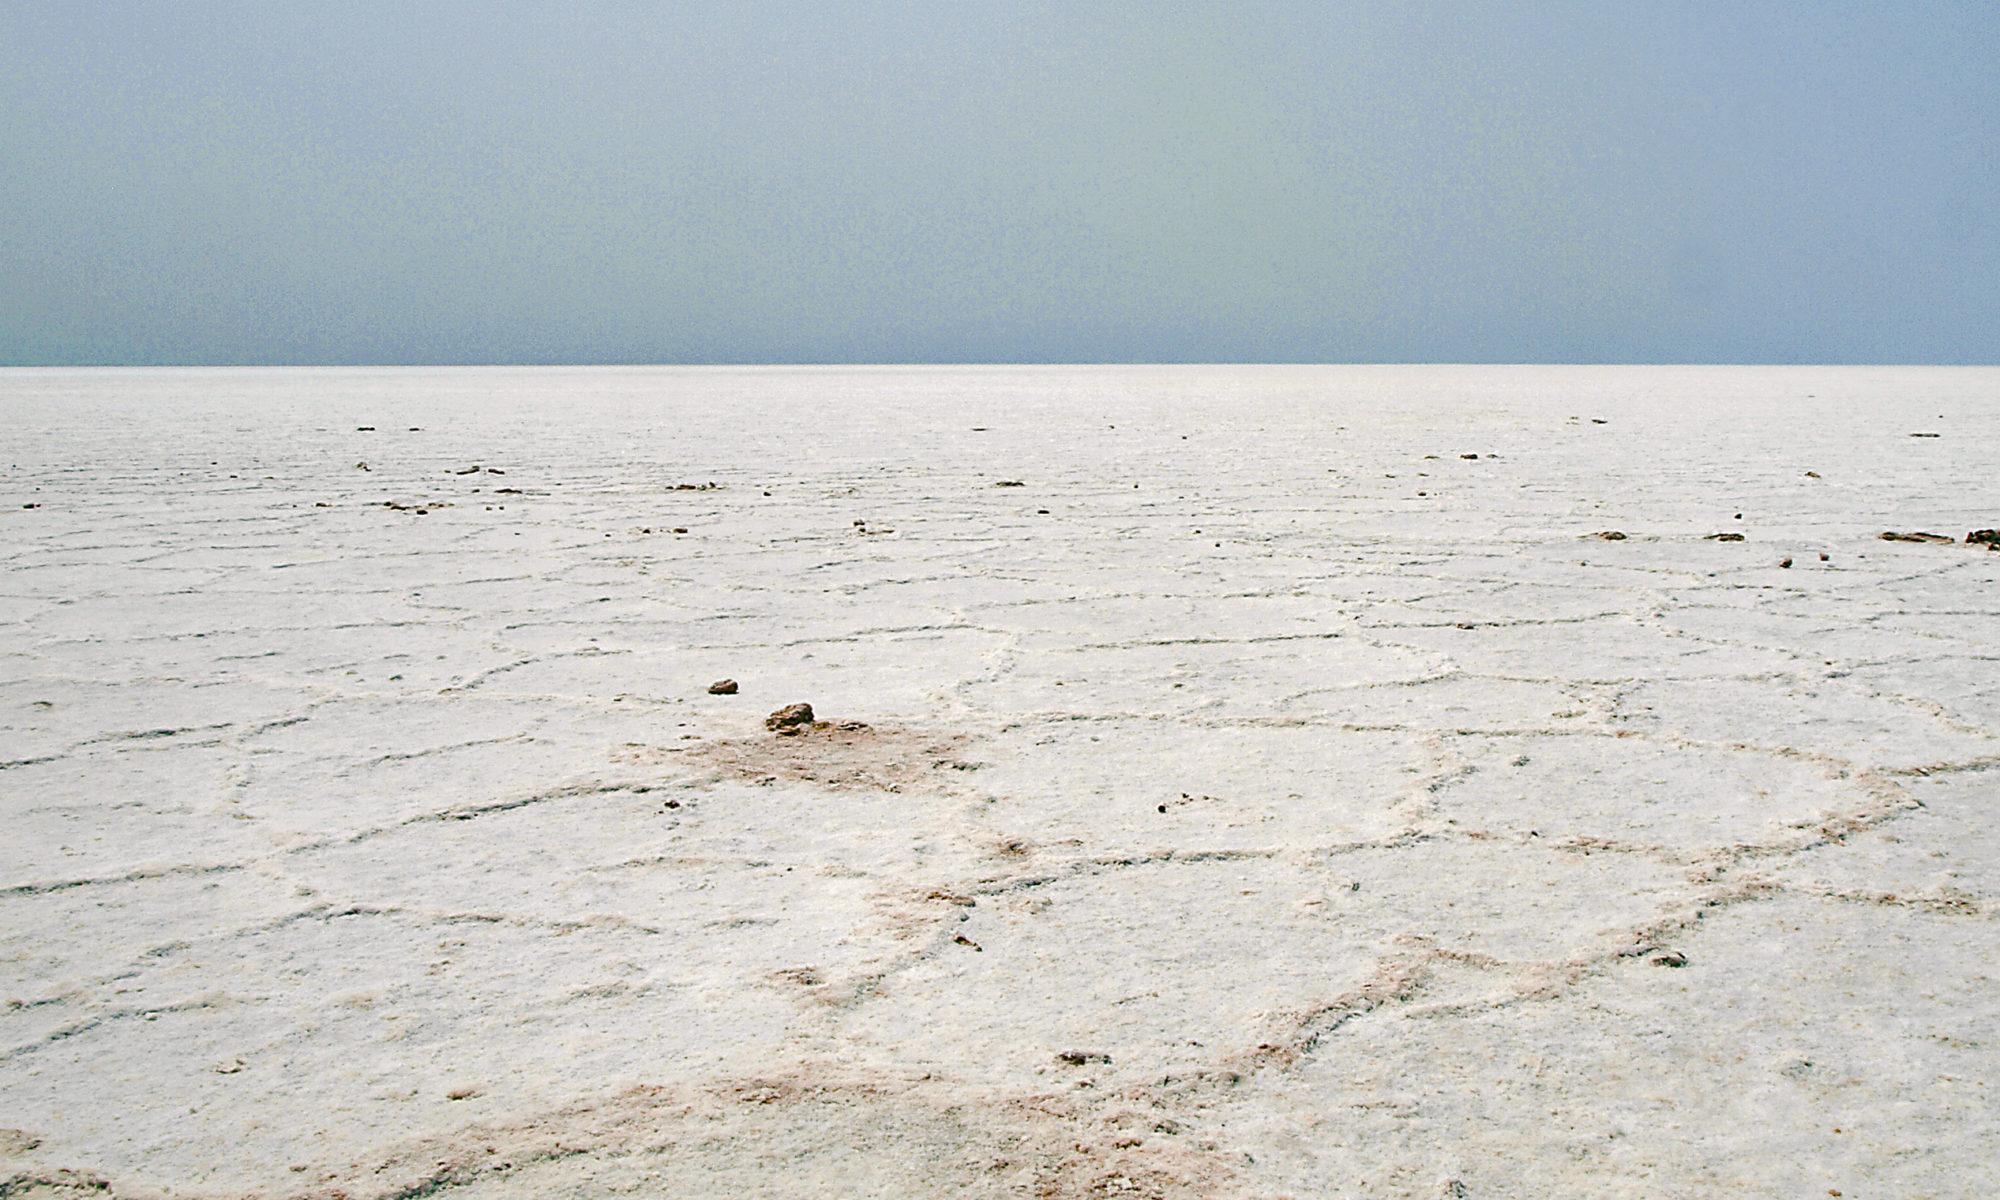 Badwater basin el mar de sal / The pool of salt